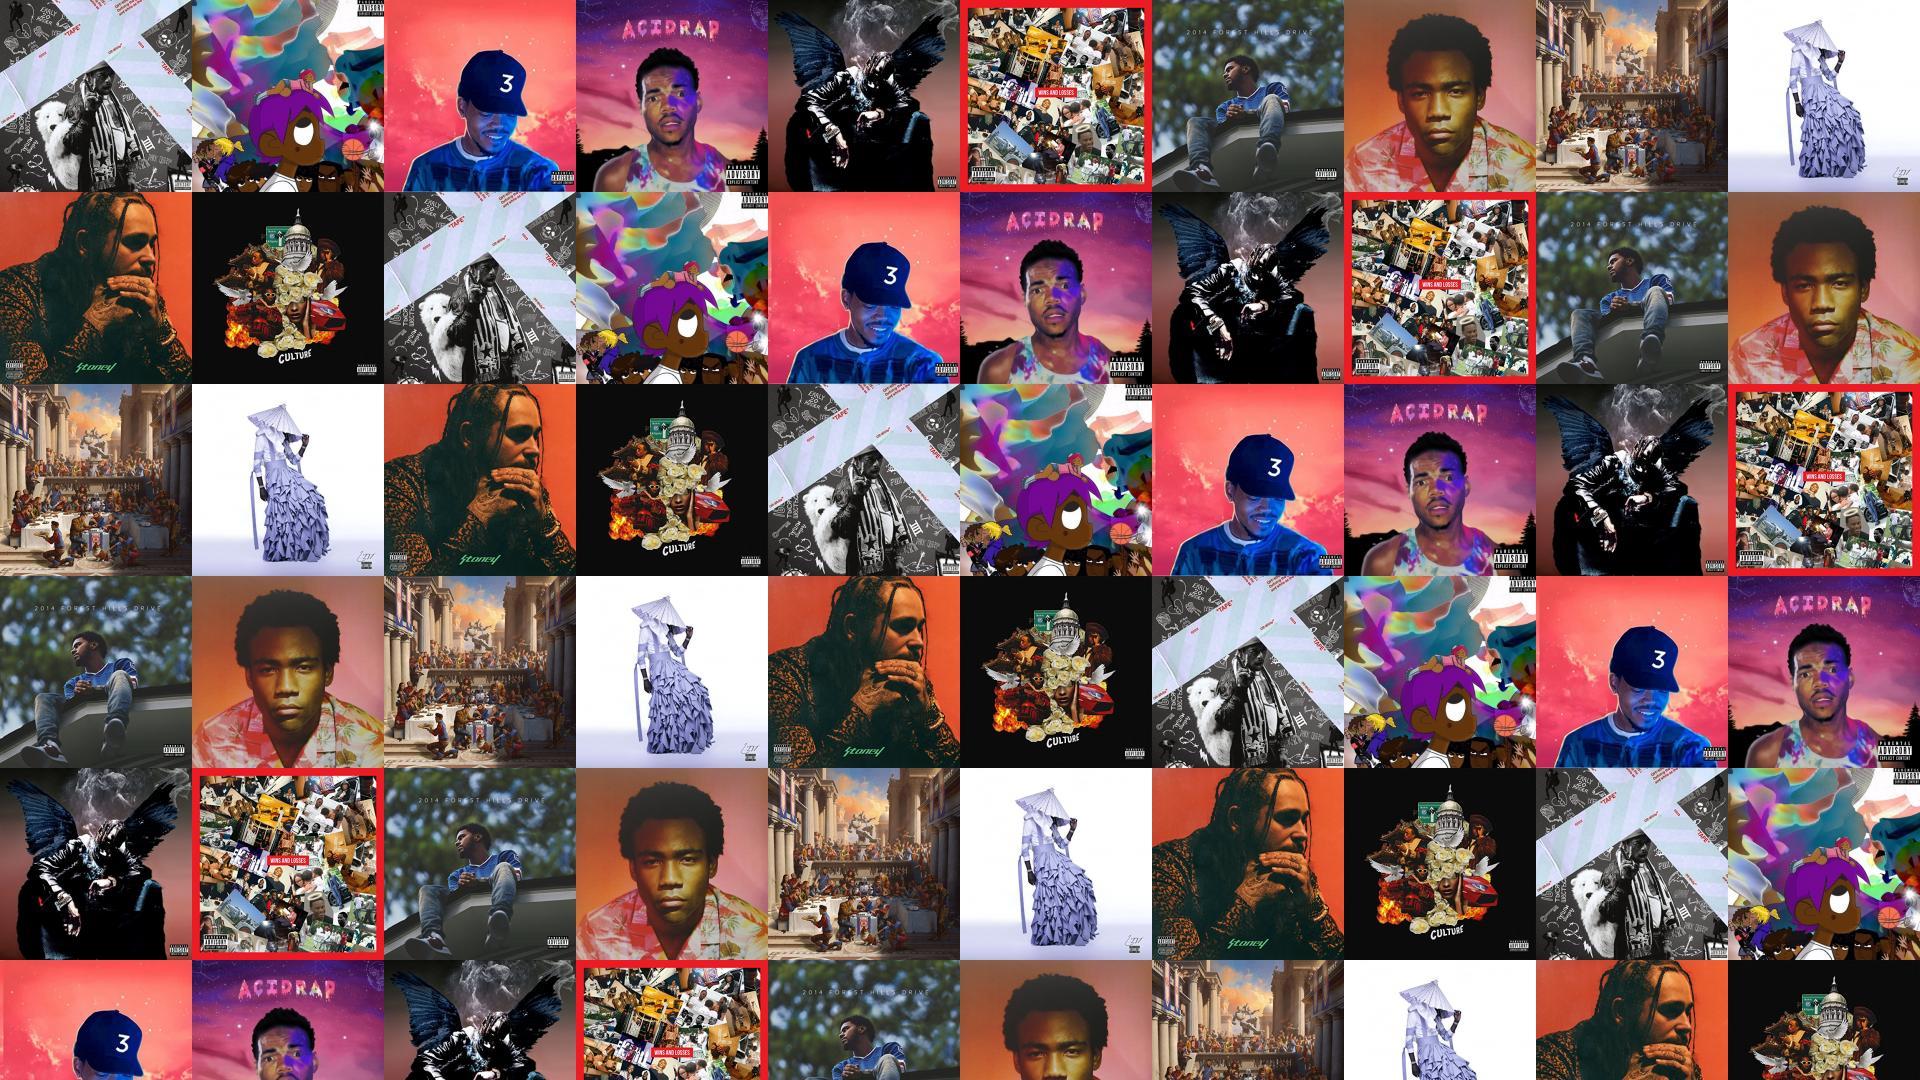 Lil Uzi Vert Desktop Wallpaper Posted By John Peltier